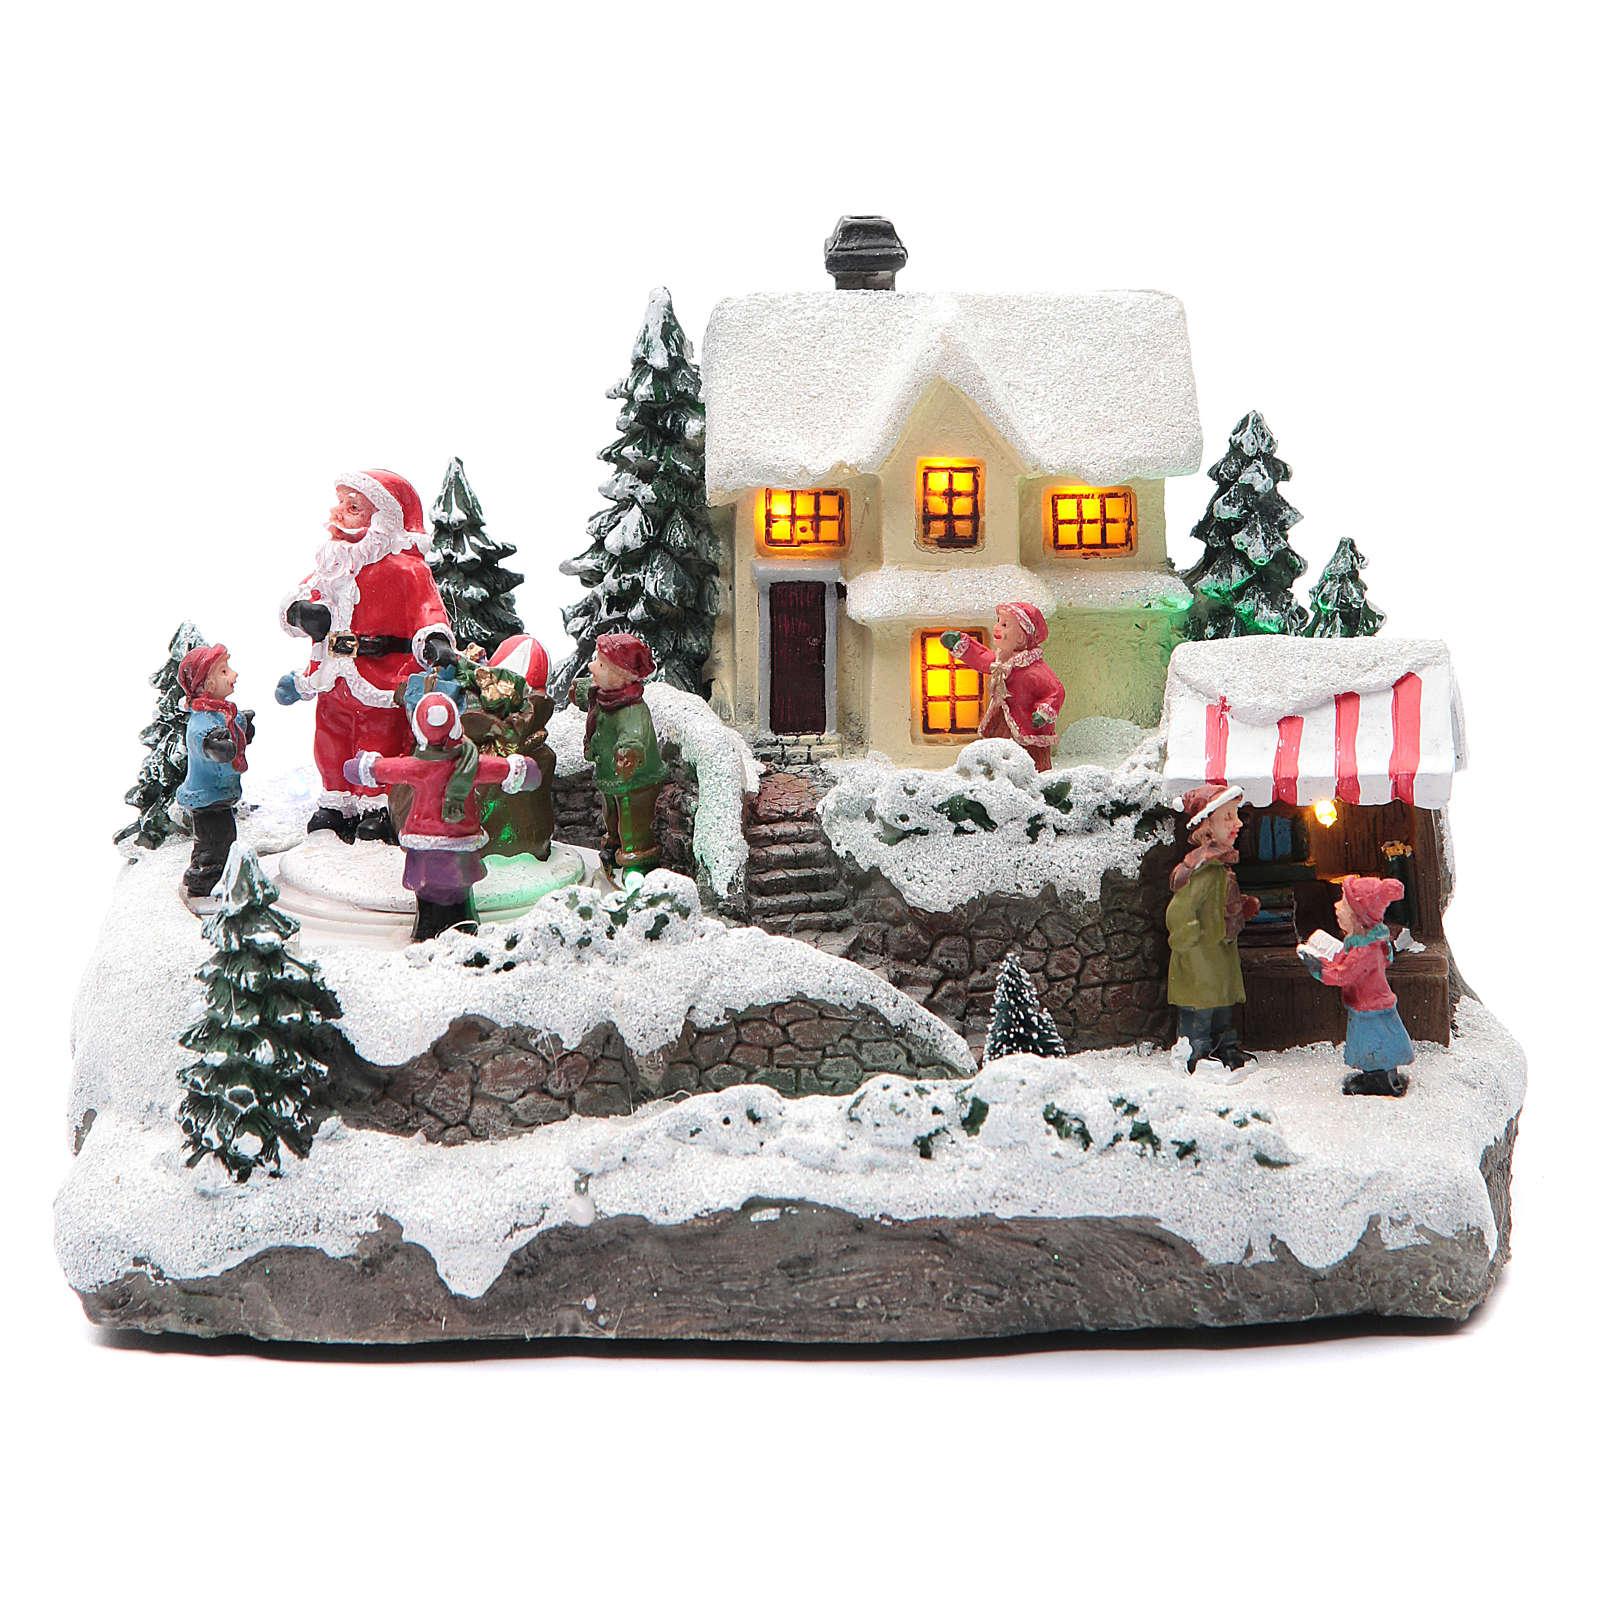 Winter village Father Christmas 25x15x15 cm 3